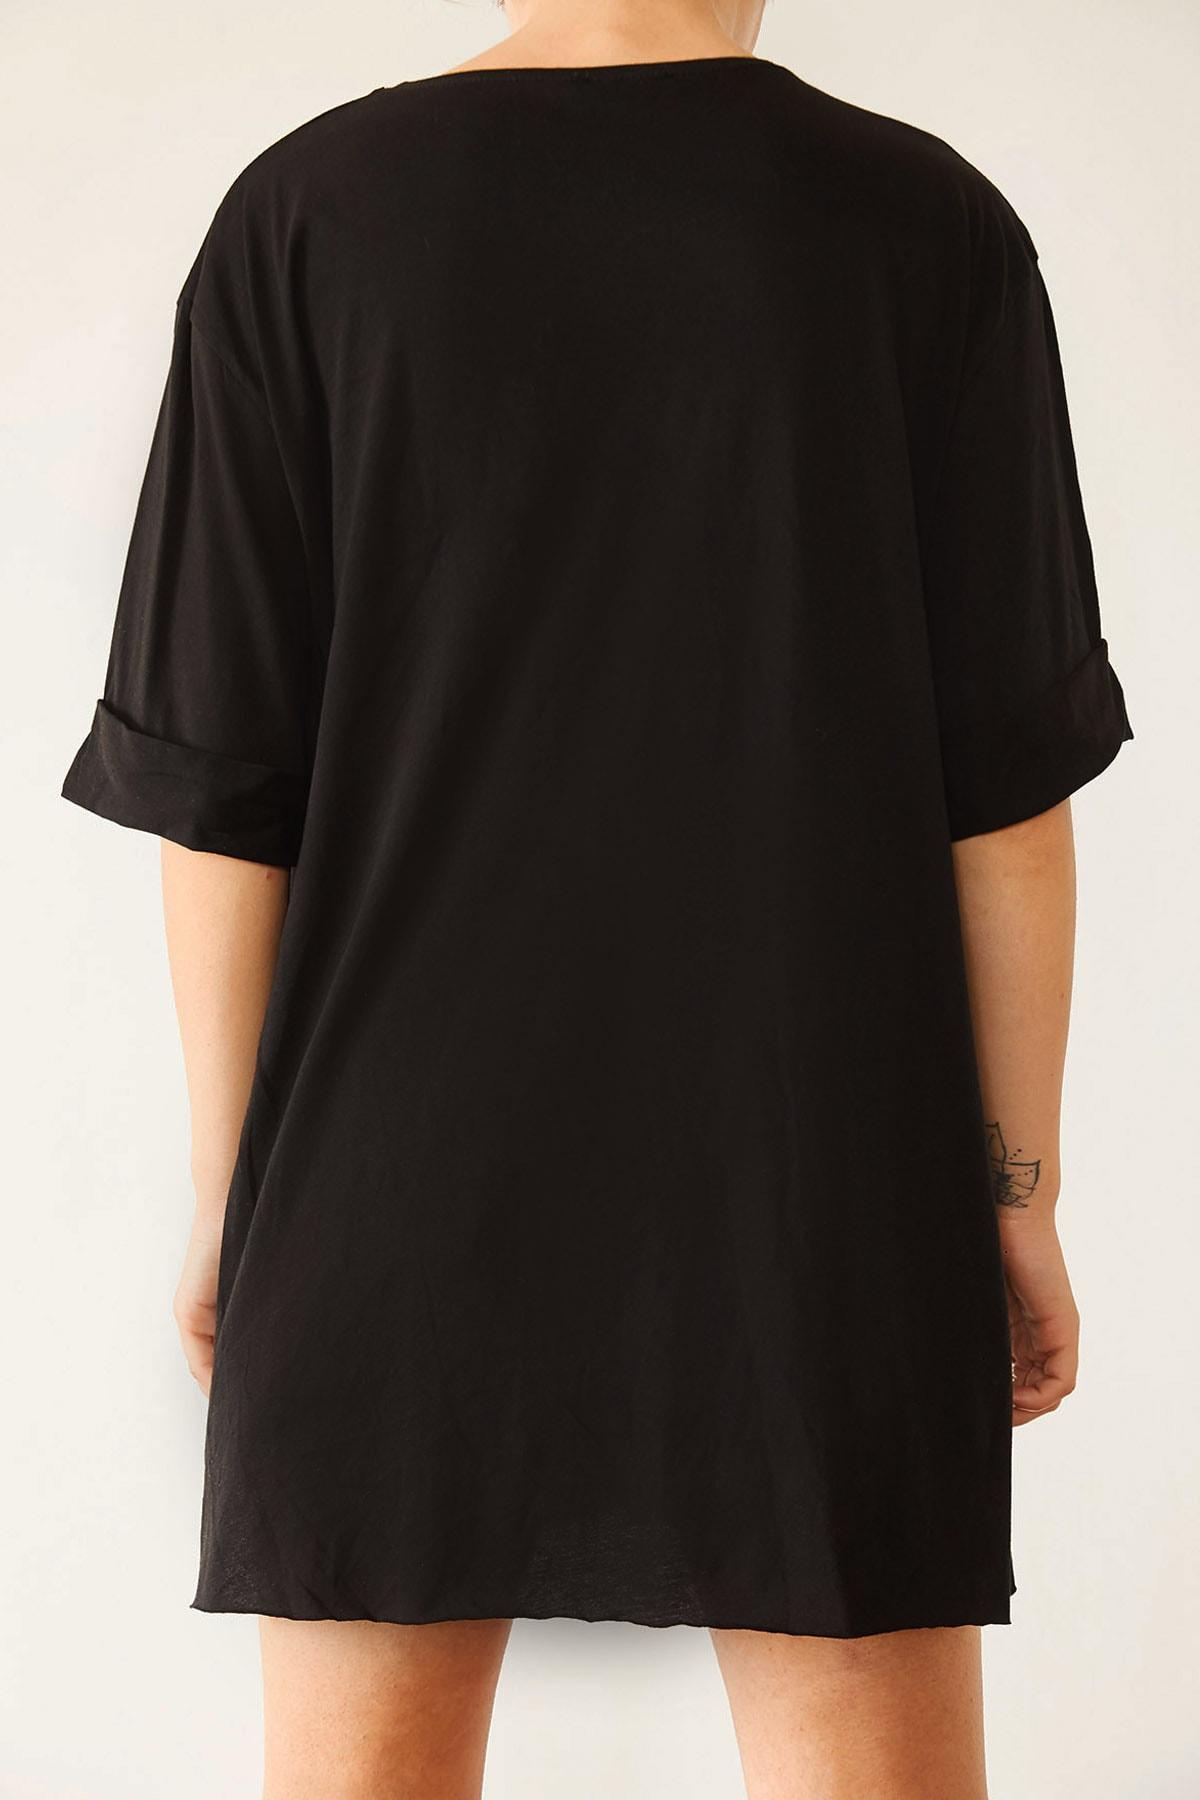 XENA Kadın Siyah Boyfriend Basic Tişört 0YZK1-10343 2